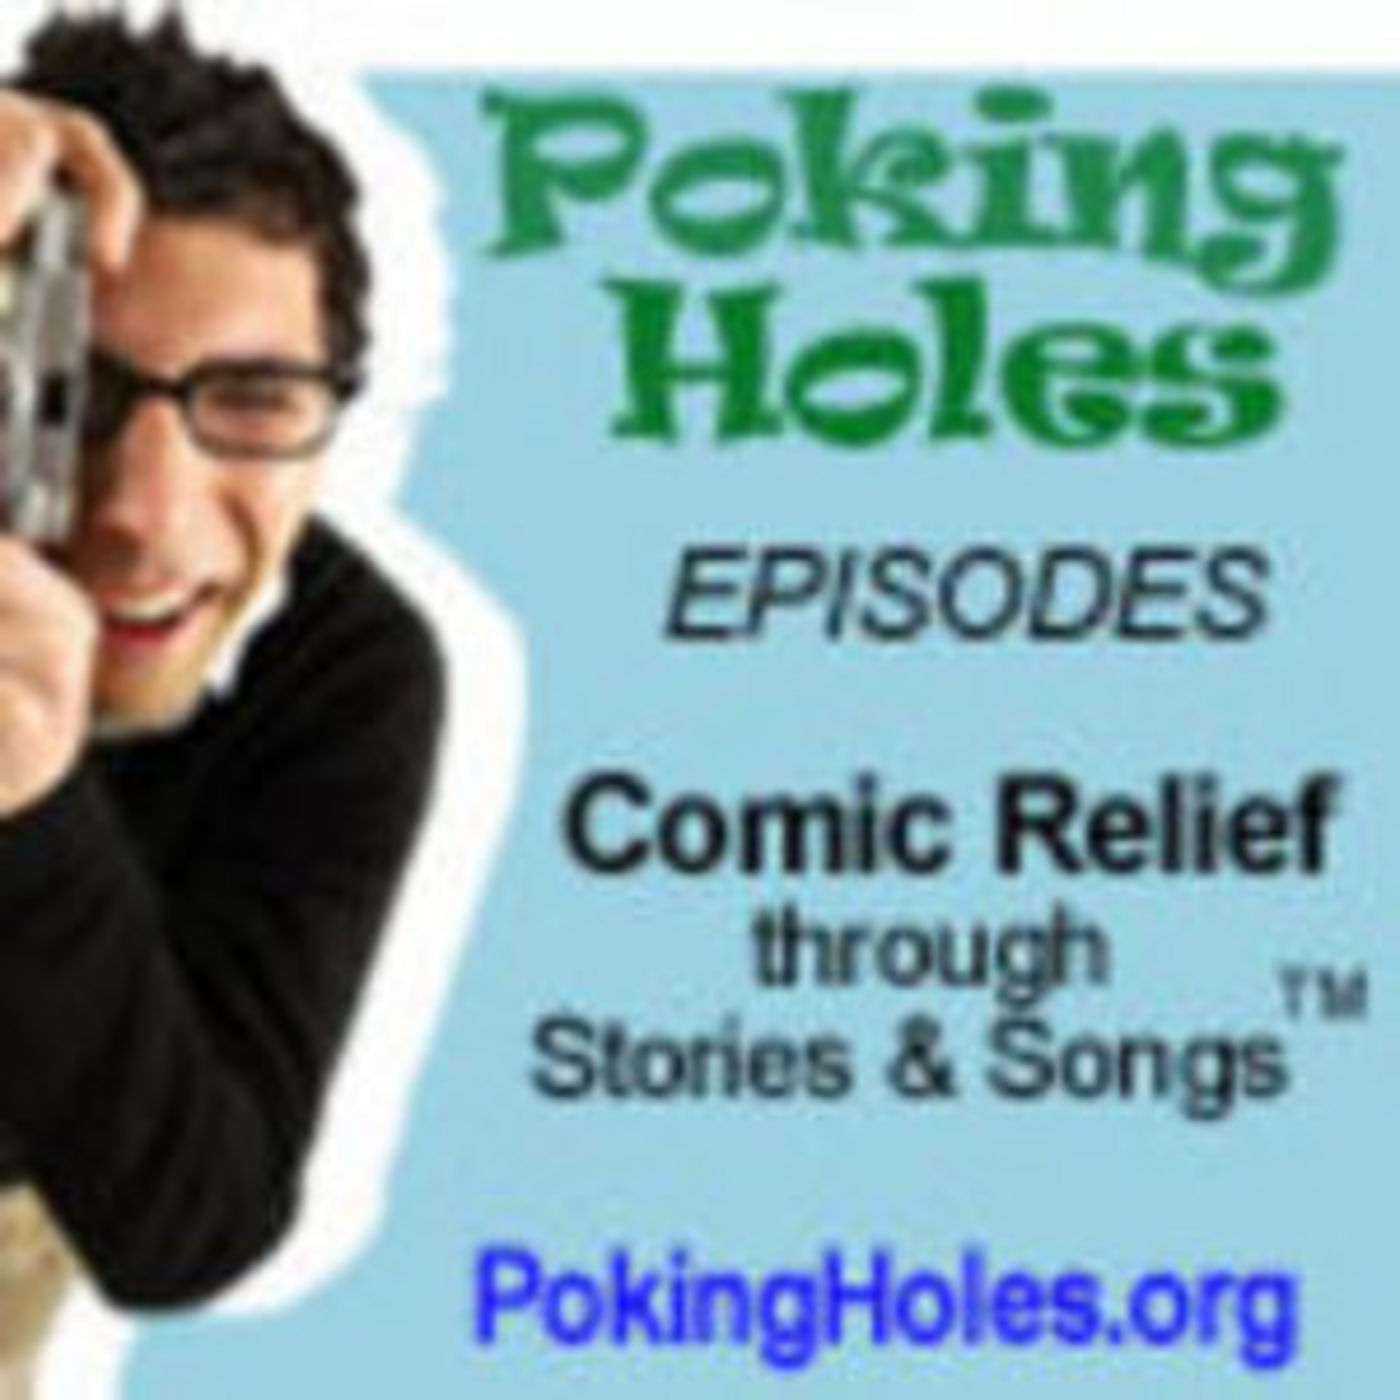 <![CDATA[Poking Holes]]>